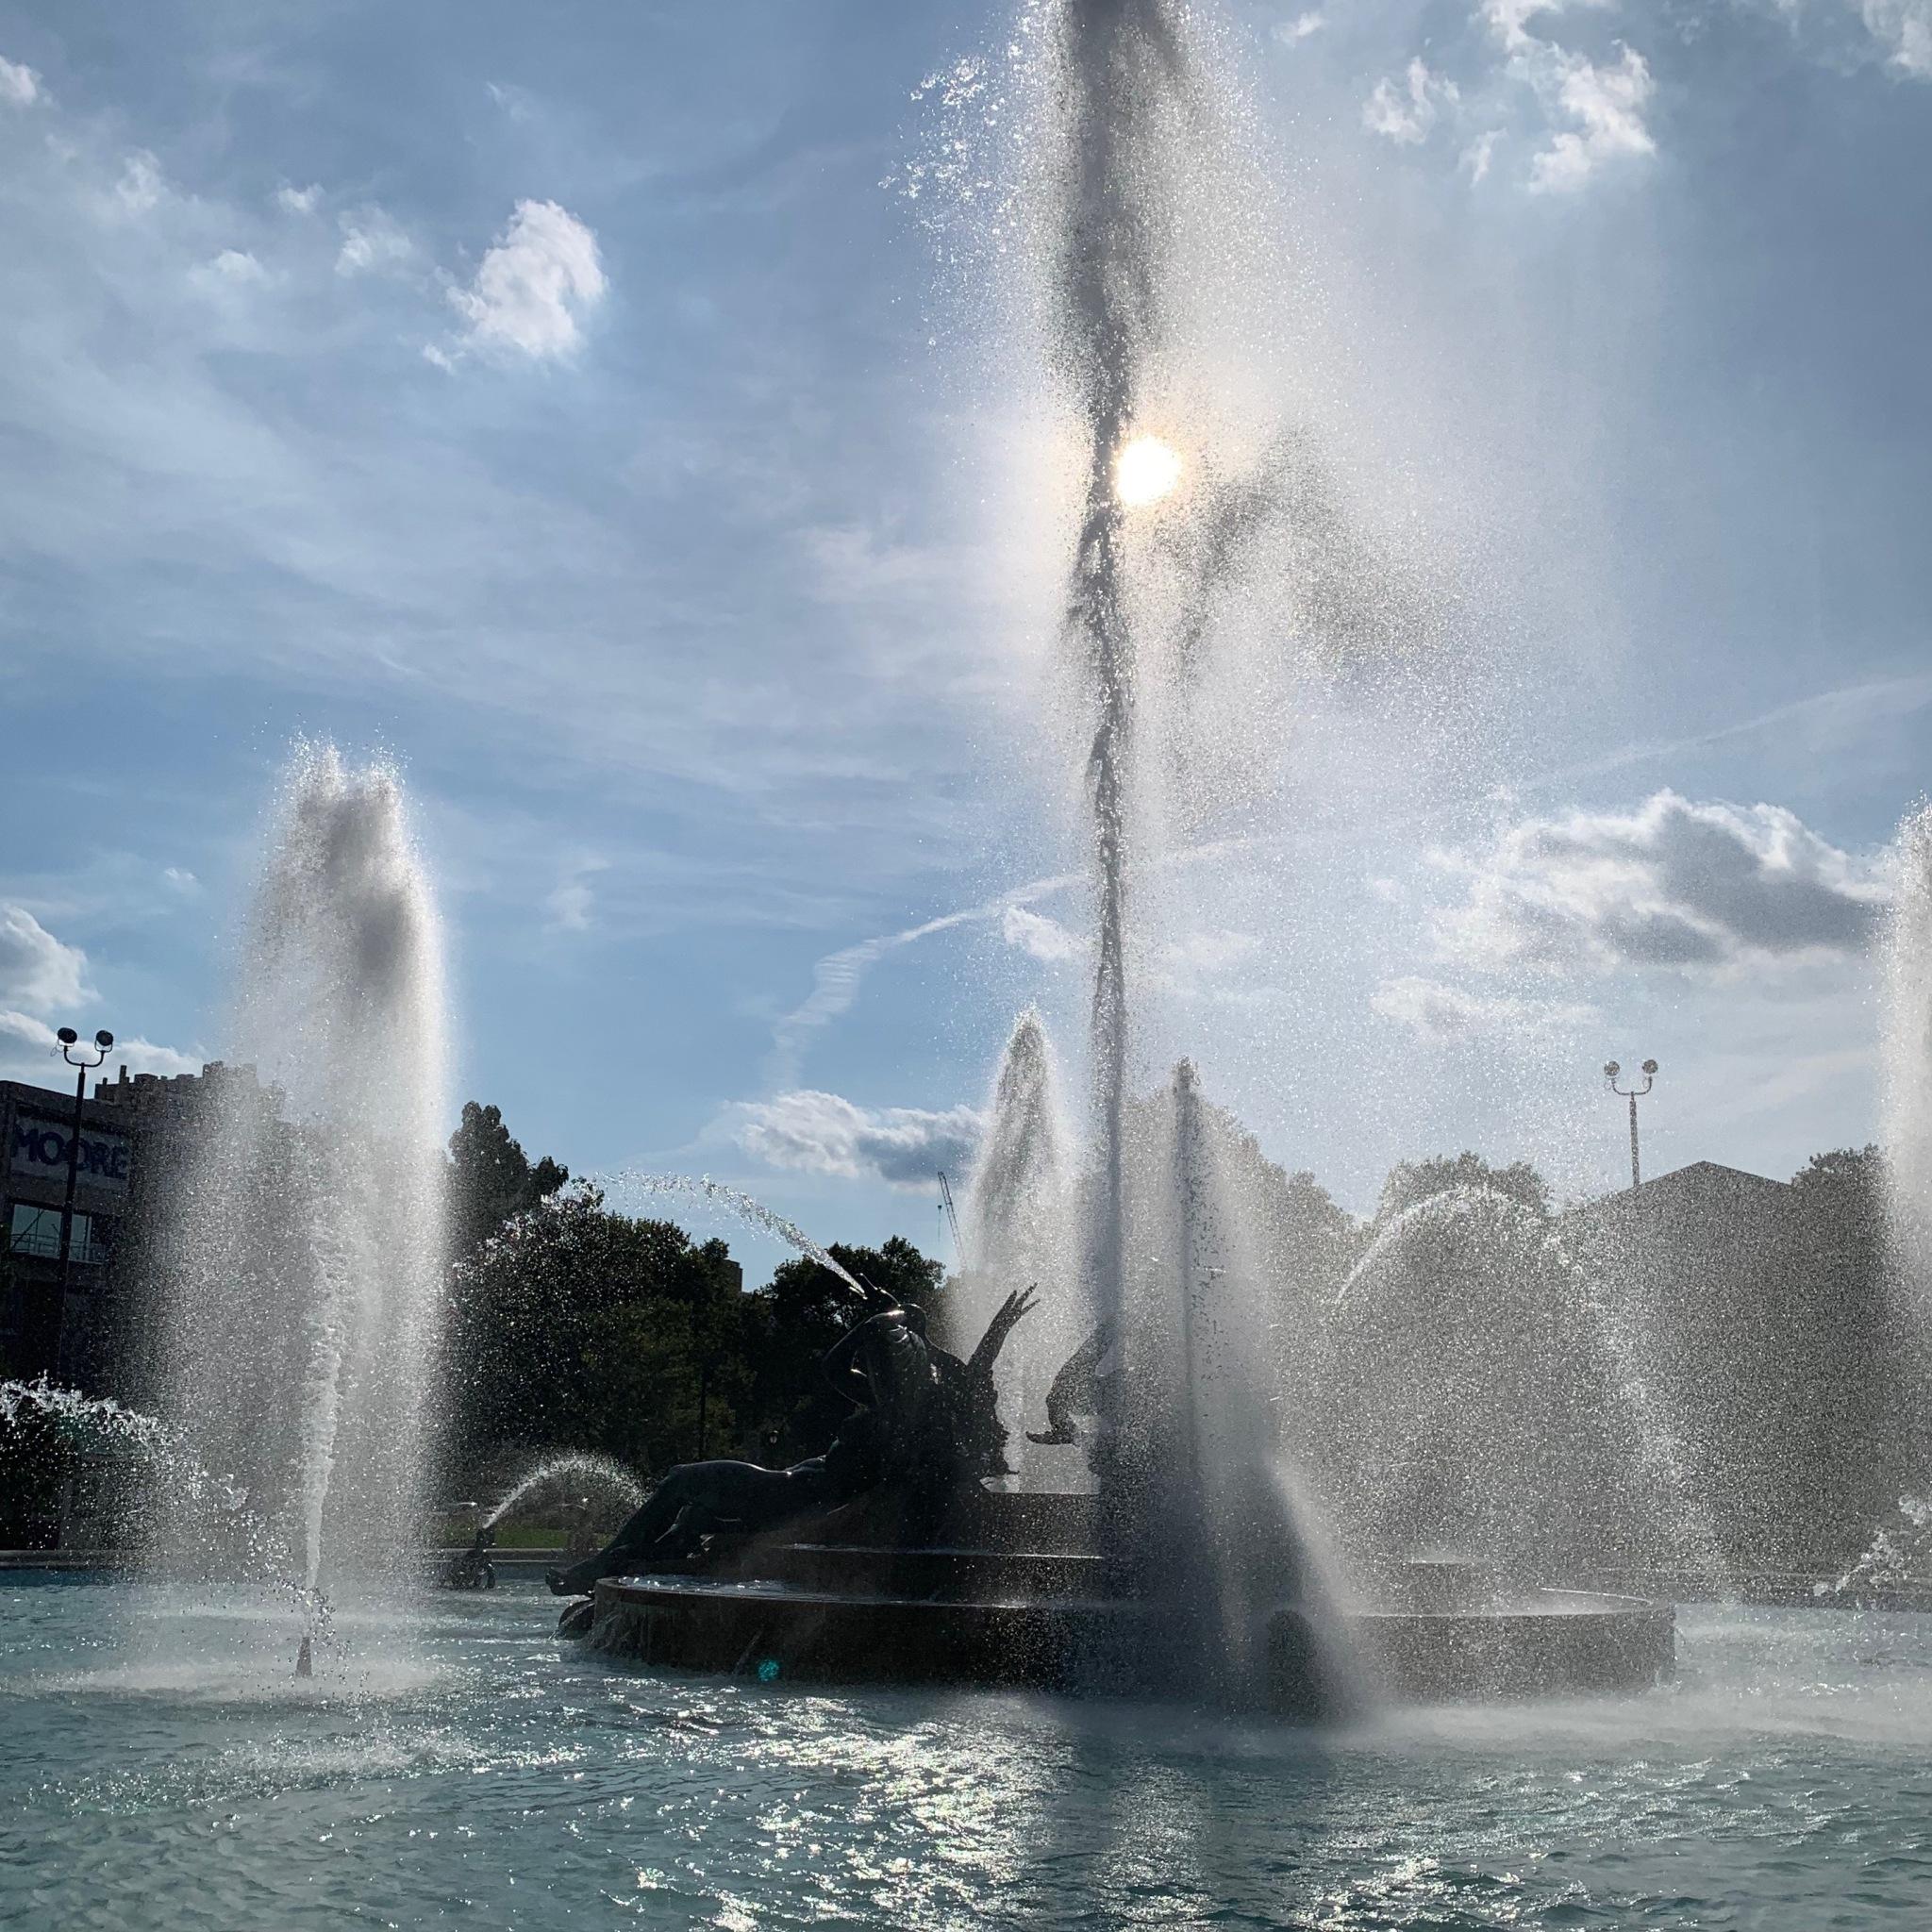 Swann Memorial Fountain Glittering in the Sun, Philadelphia